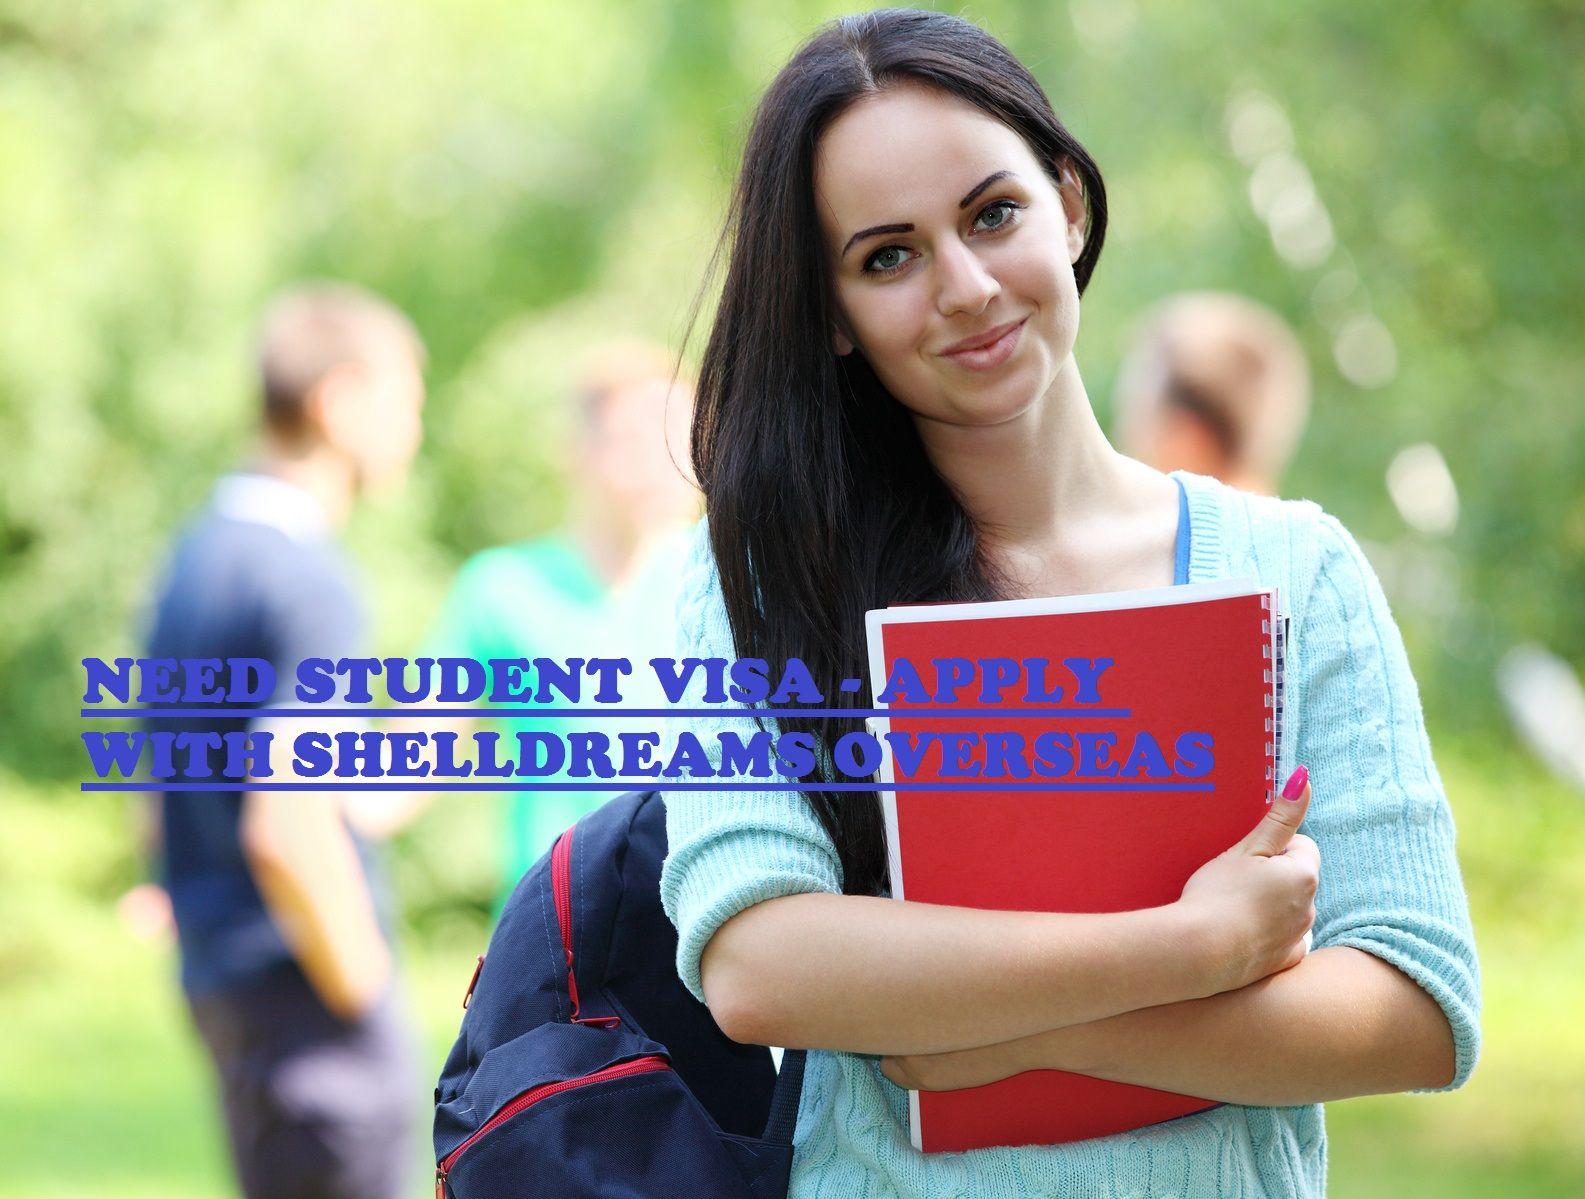 We Provide student Visa for USA, CANADA, AUSTRALIA, NEW